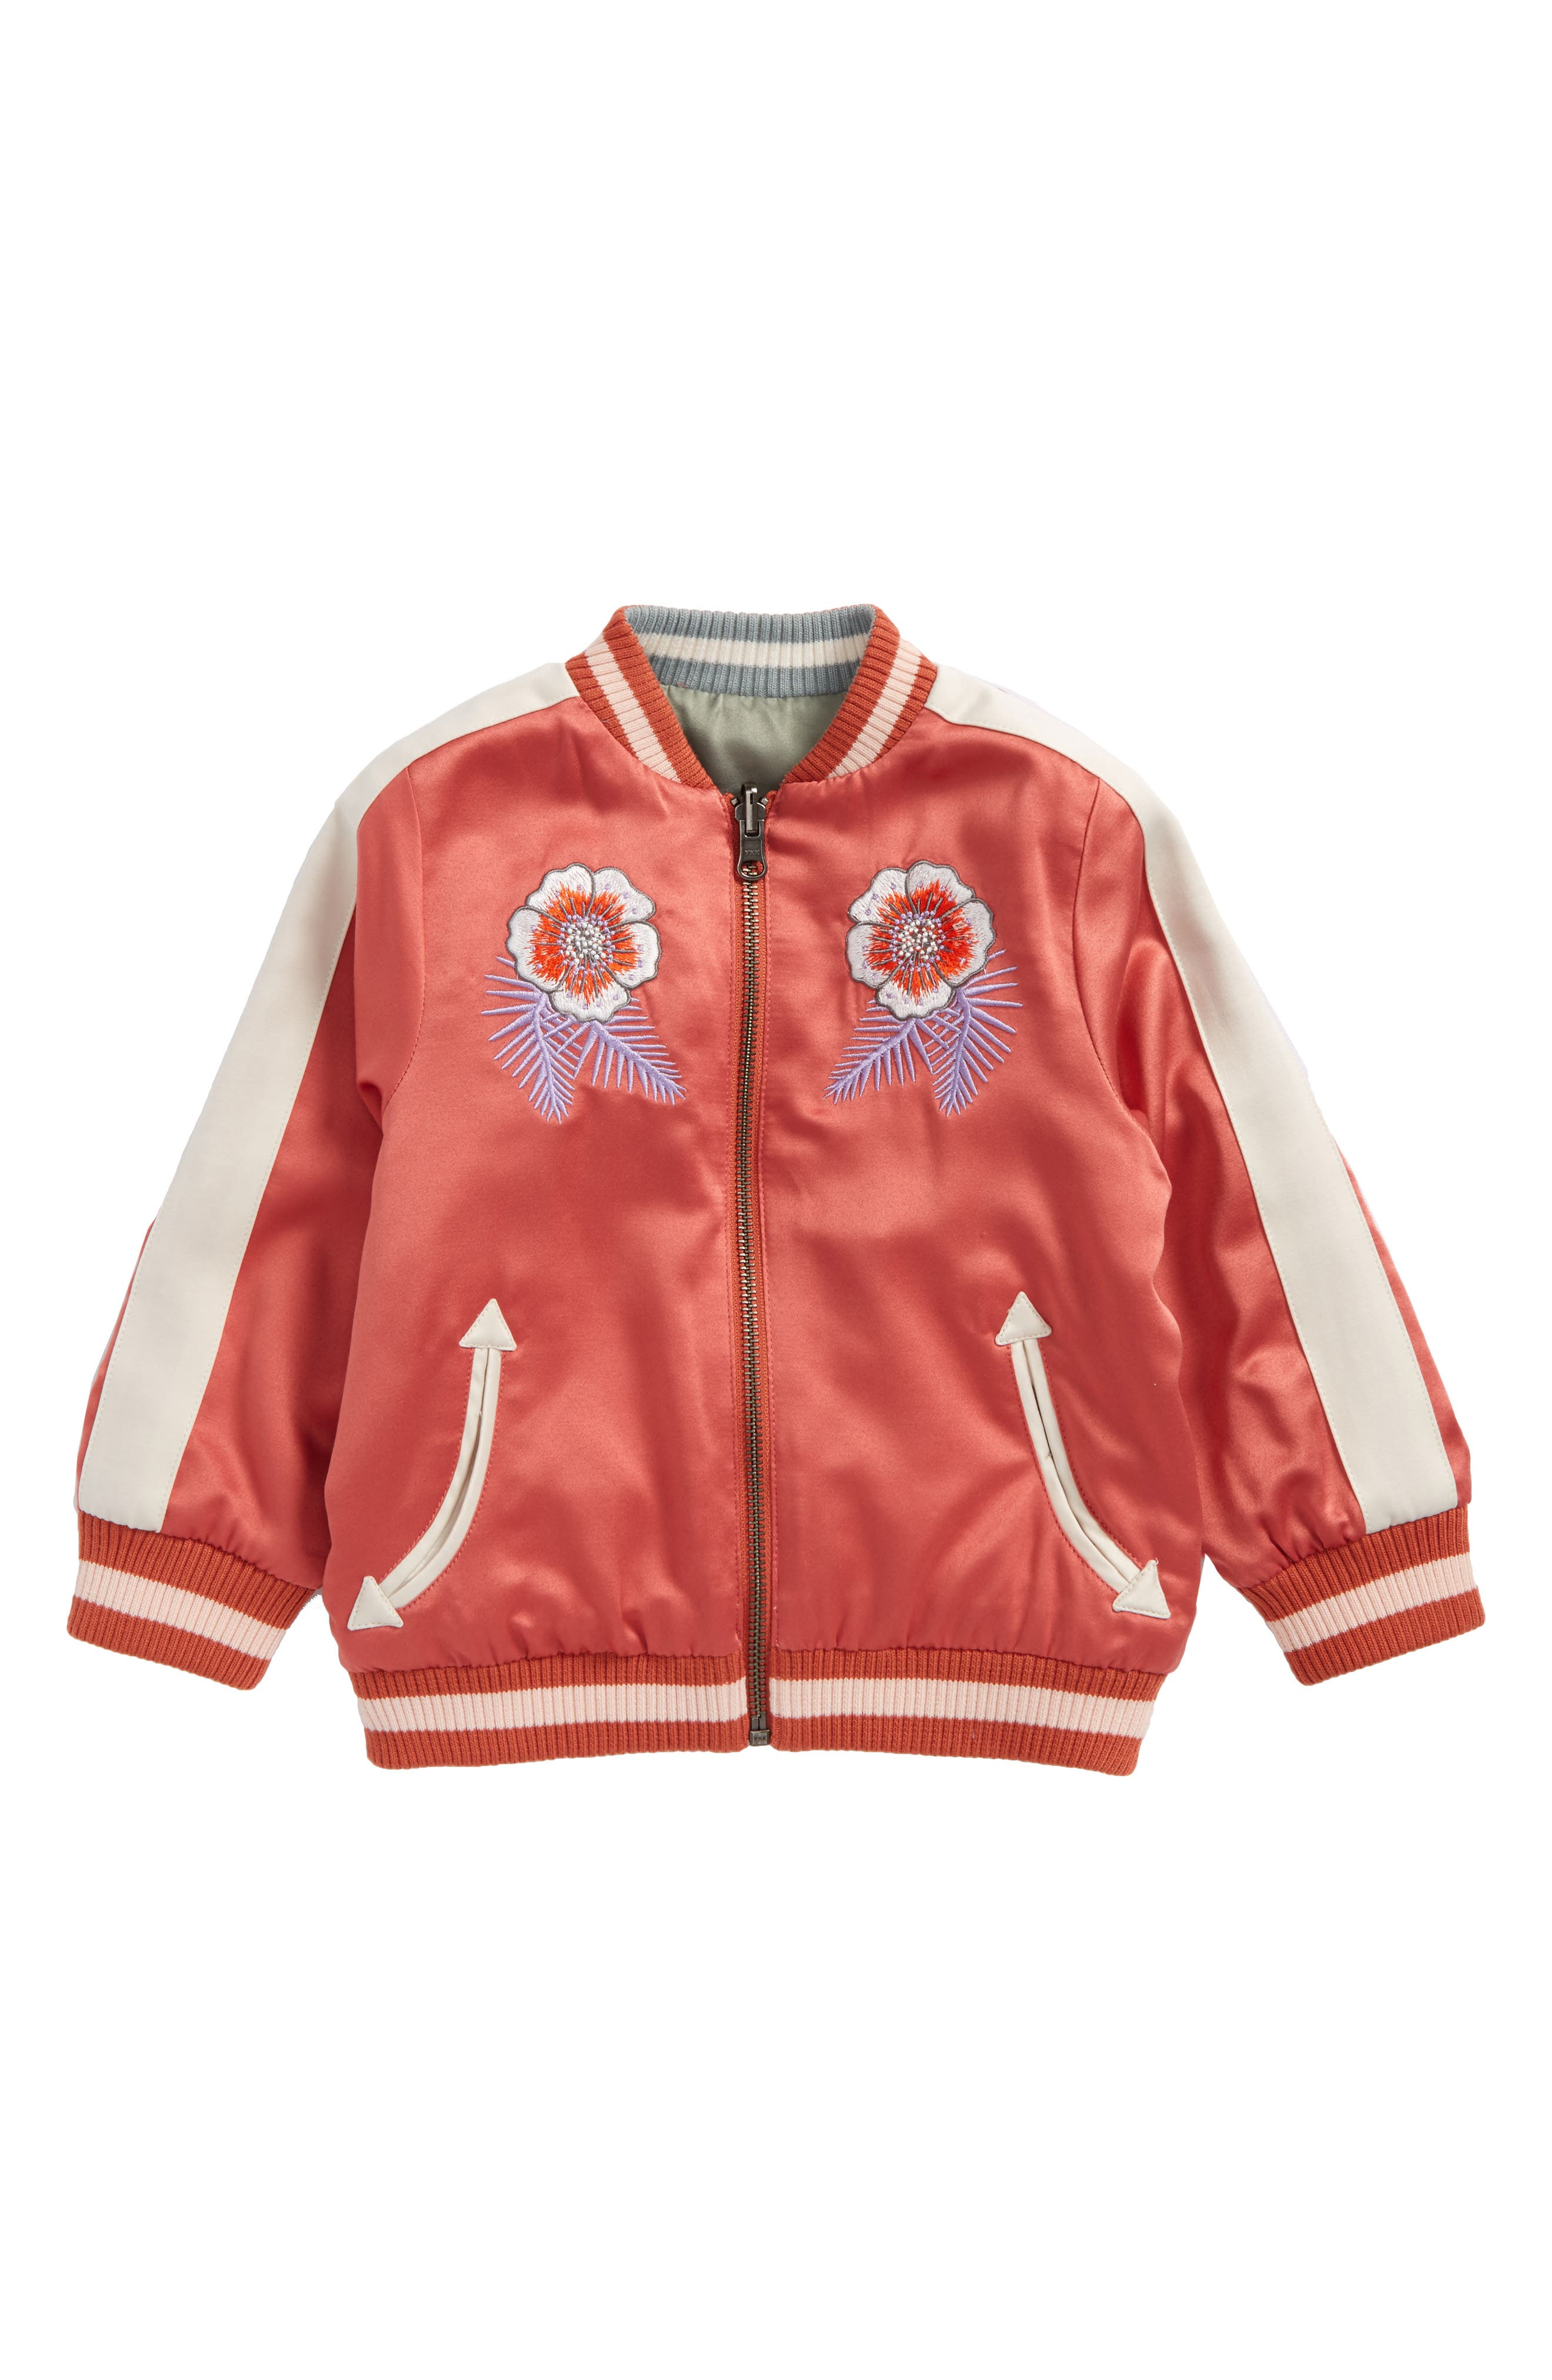 Stella McCartney Willow Embroidered Reversible Bomber Jacket (Toddler Girls, Little Girls & Big Girls)